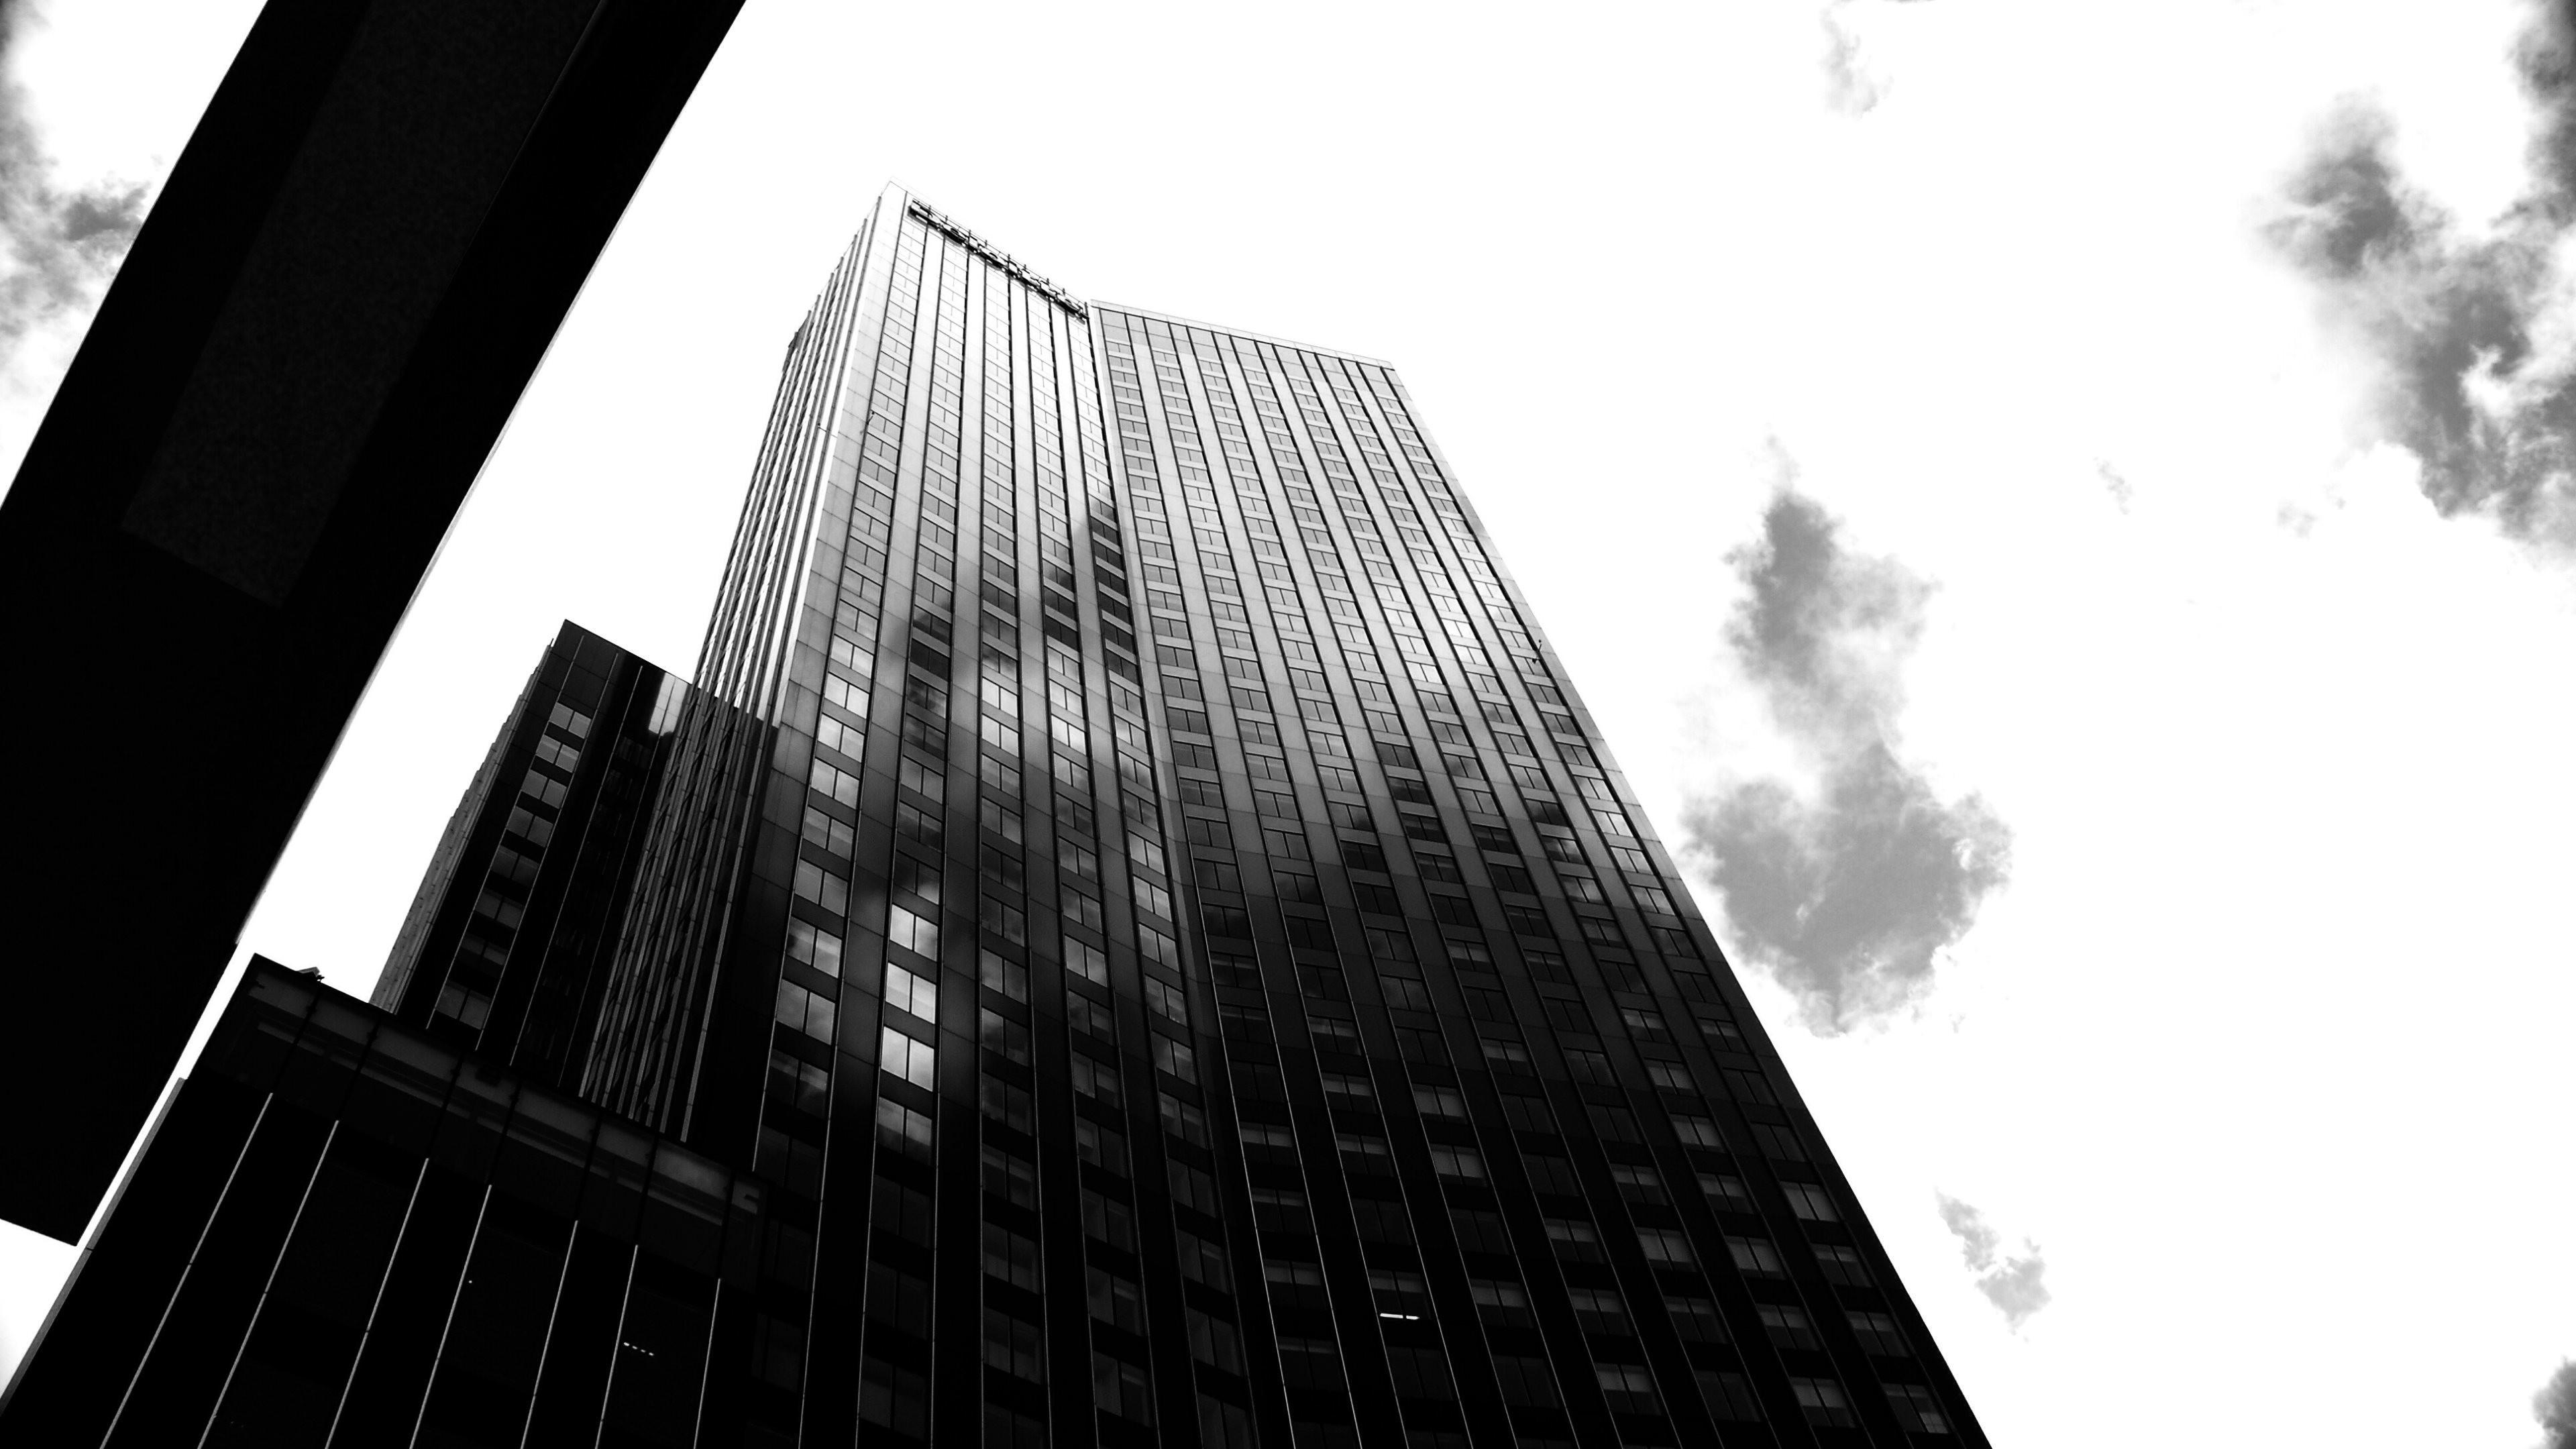 Wallpaper: Skyscraper from Rotterdam in black and white. Ultra HD 4K  3840×2160